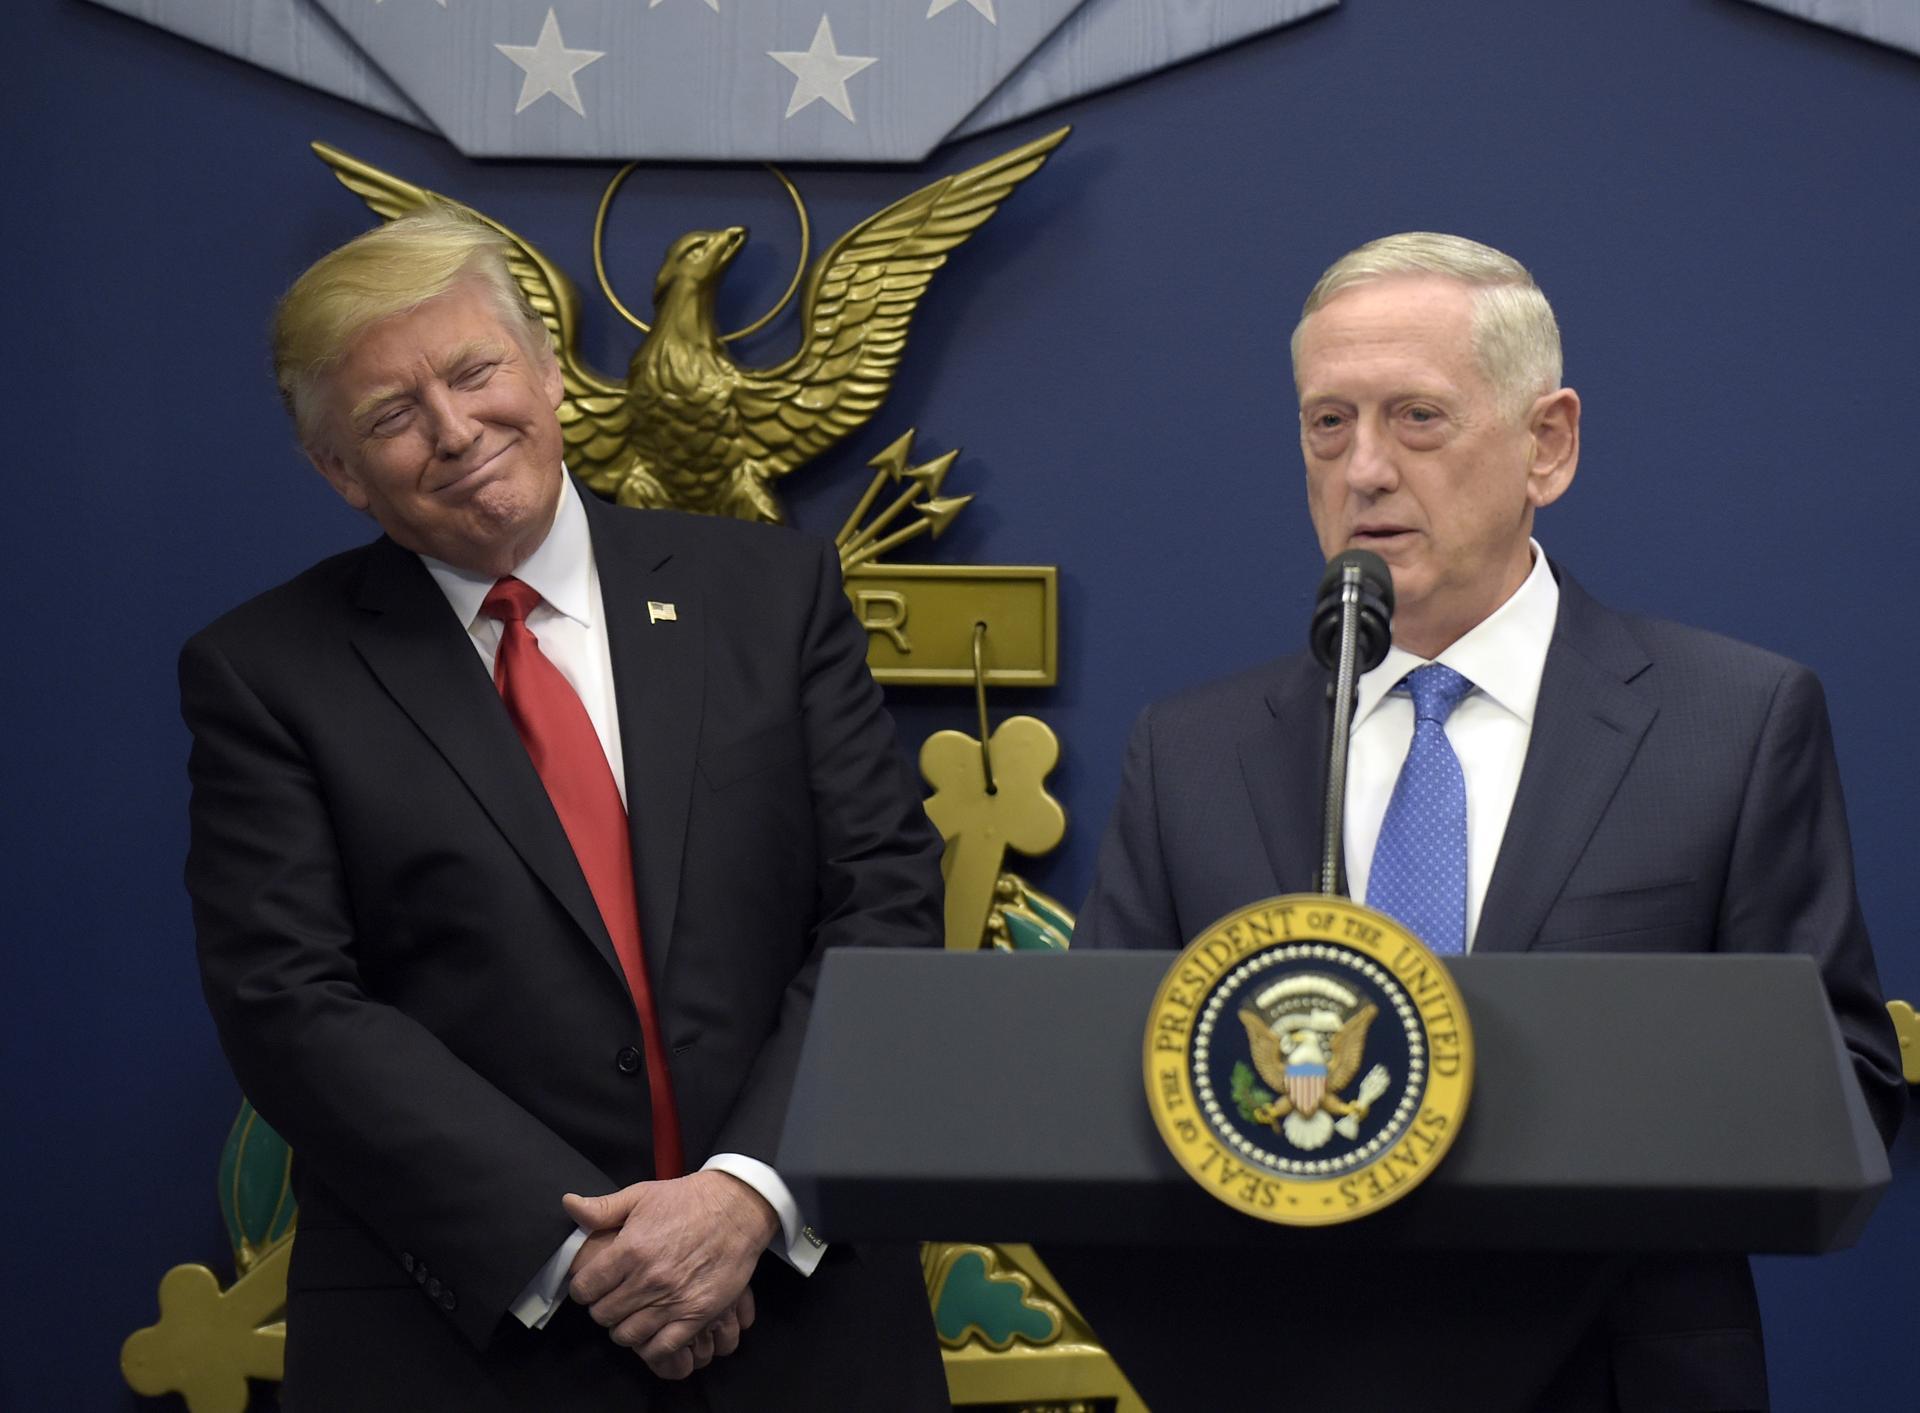 Us Cabinet Secretaries What Happens When The President And His Cabinet Secretaries Make